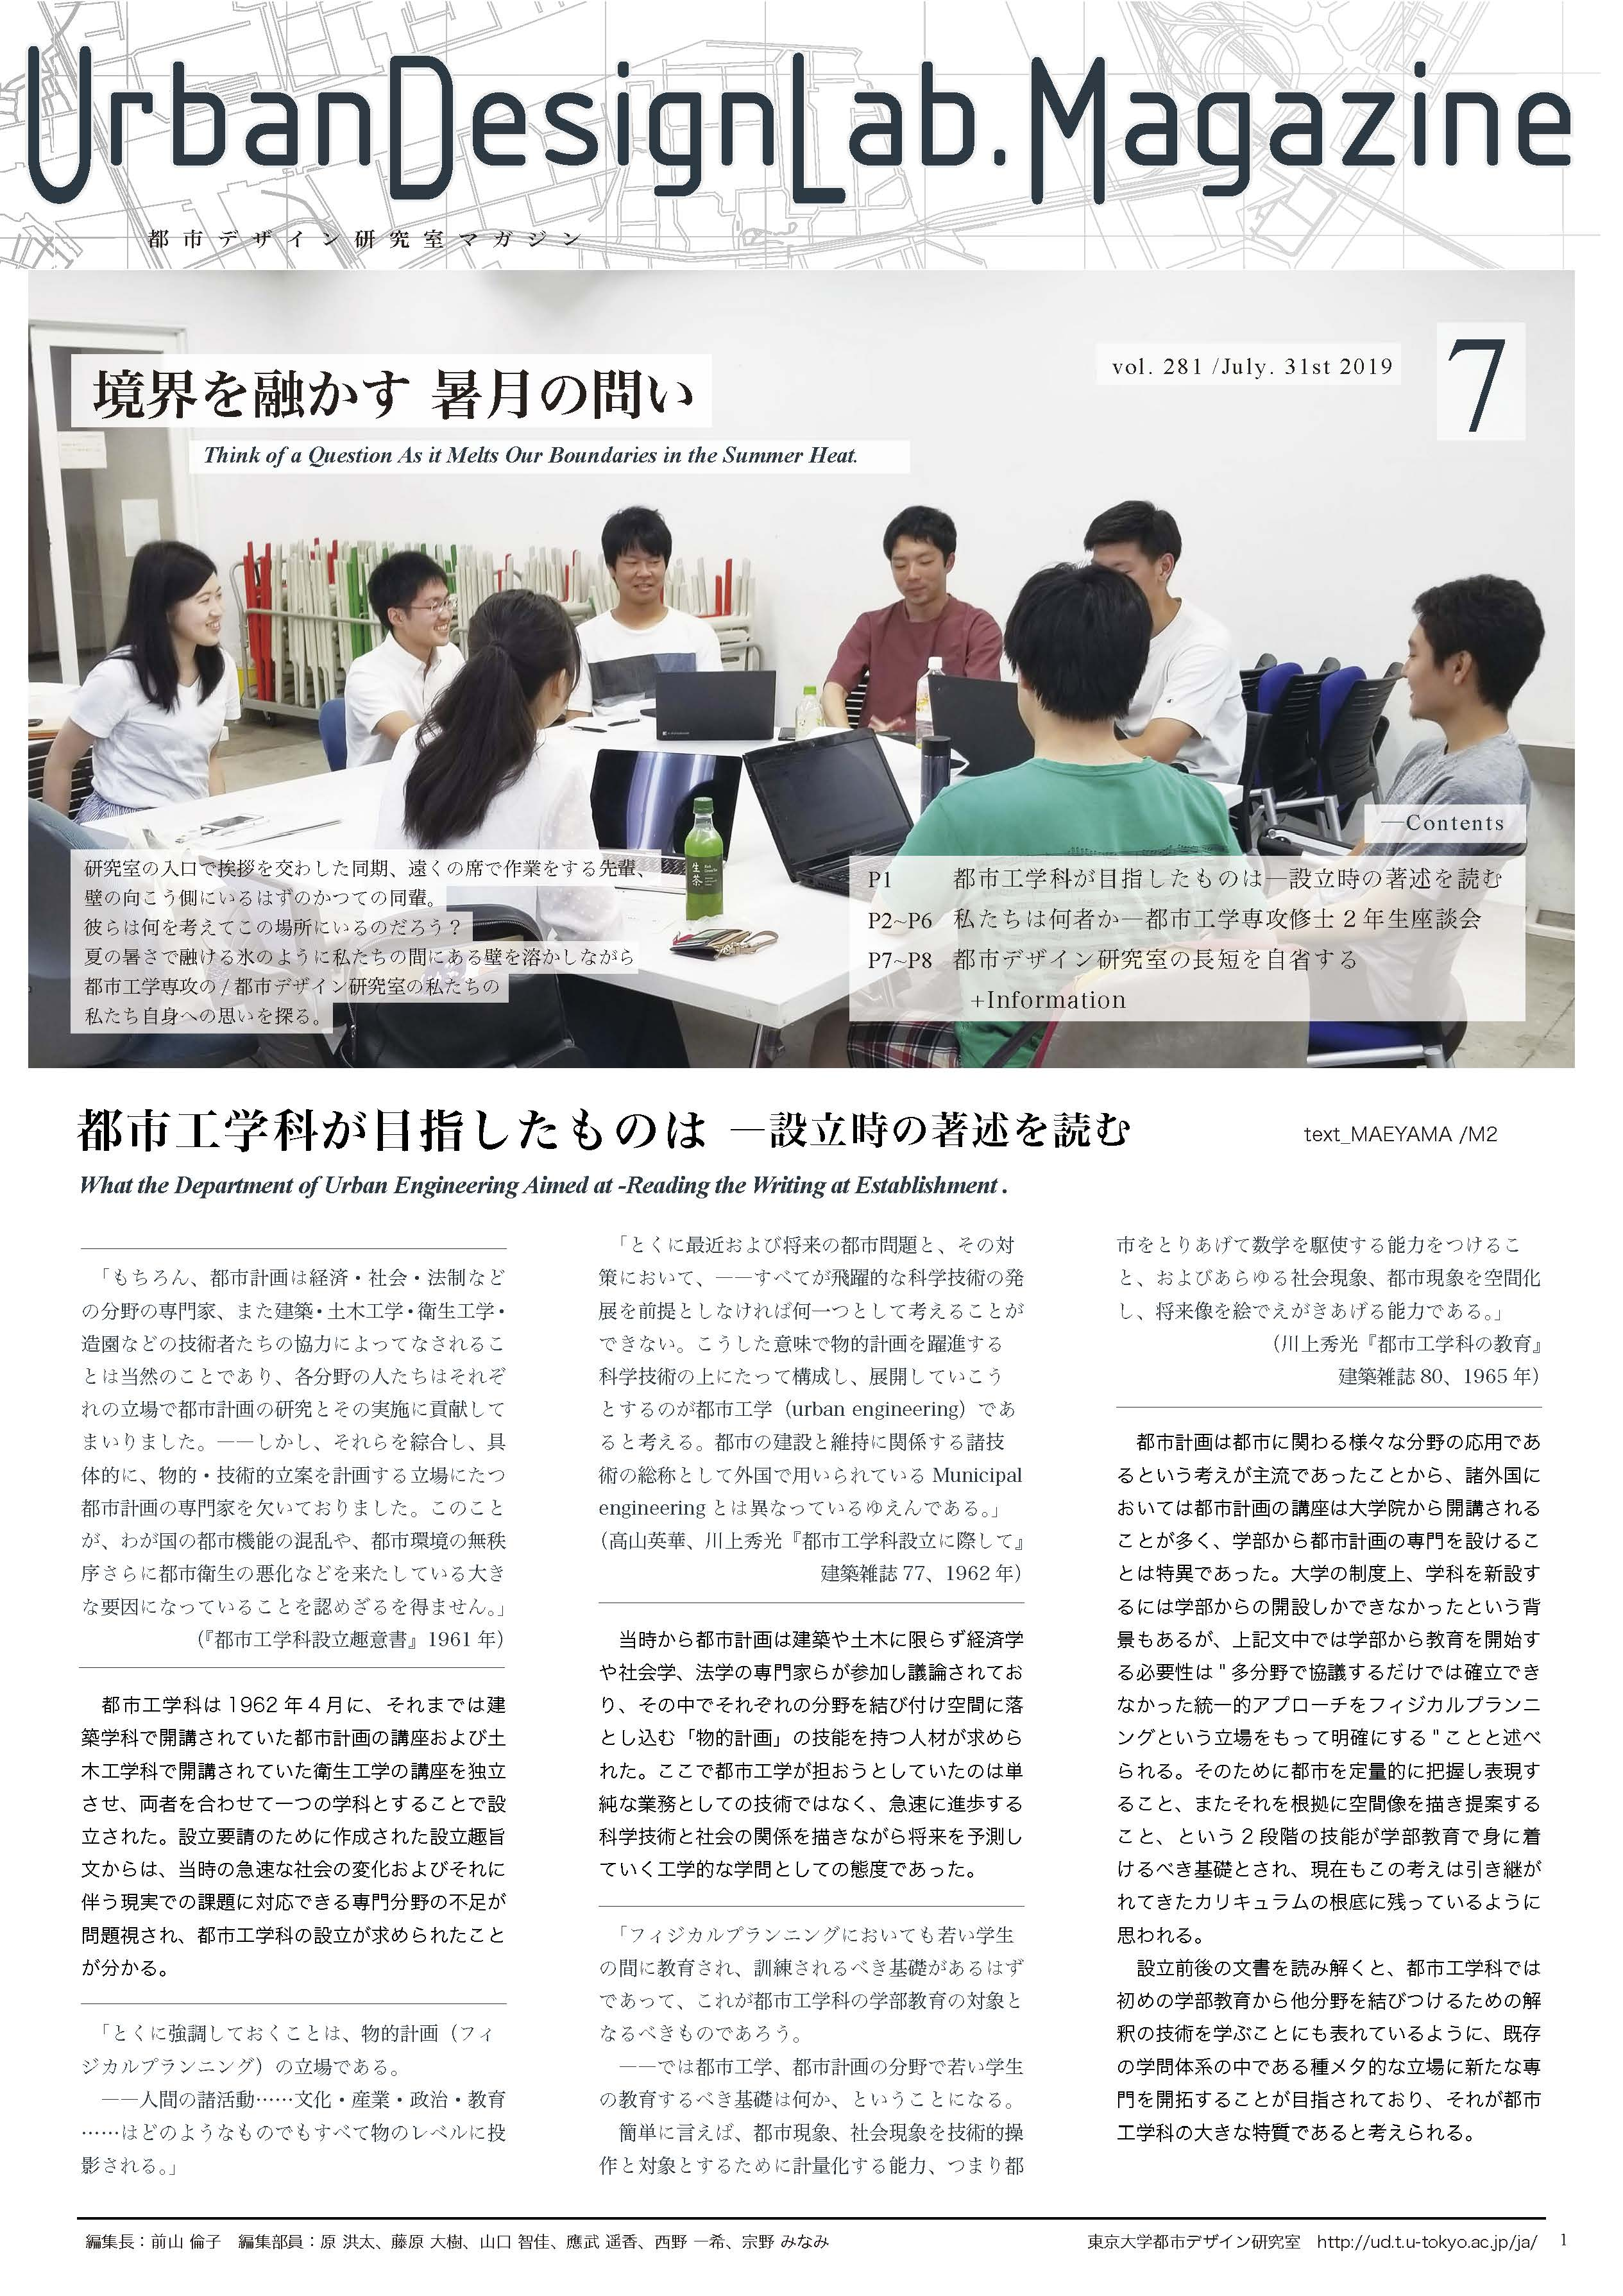 http://ud.t.u-tokyo.ac.jp/blog/_images/281%E5%8F%B7%E6%9C%80%E7%B5%82%E7%89%88_%E4%BF%AE%E6%AD%A30804_%E3%83%9A%E3%83%BC%E3%82%B8_1.jpg